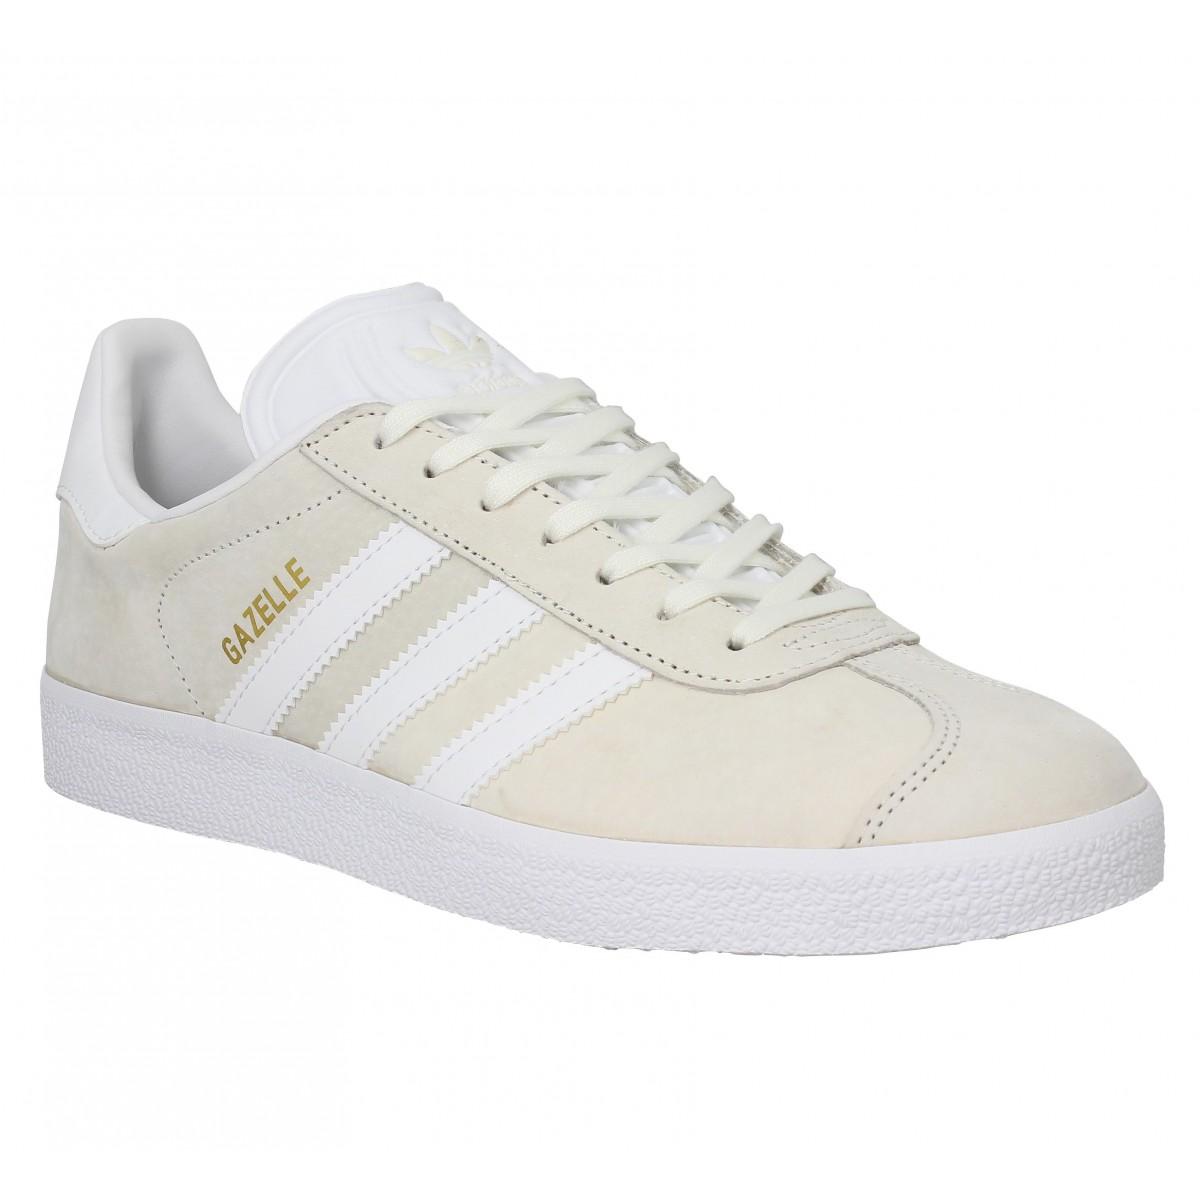 Adidas Femme Gazelle-36 2/3-off White